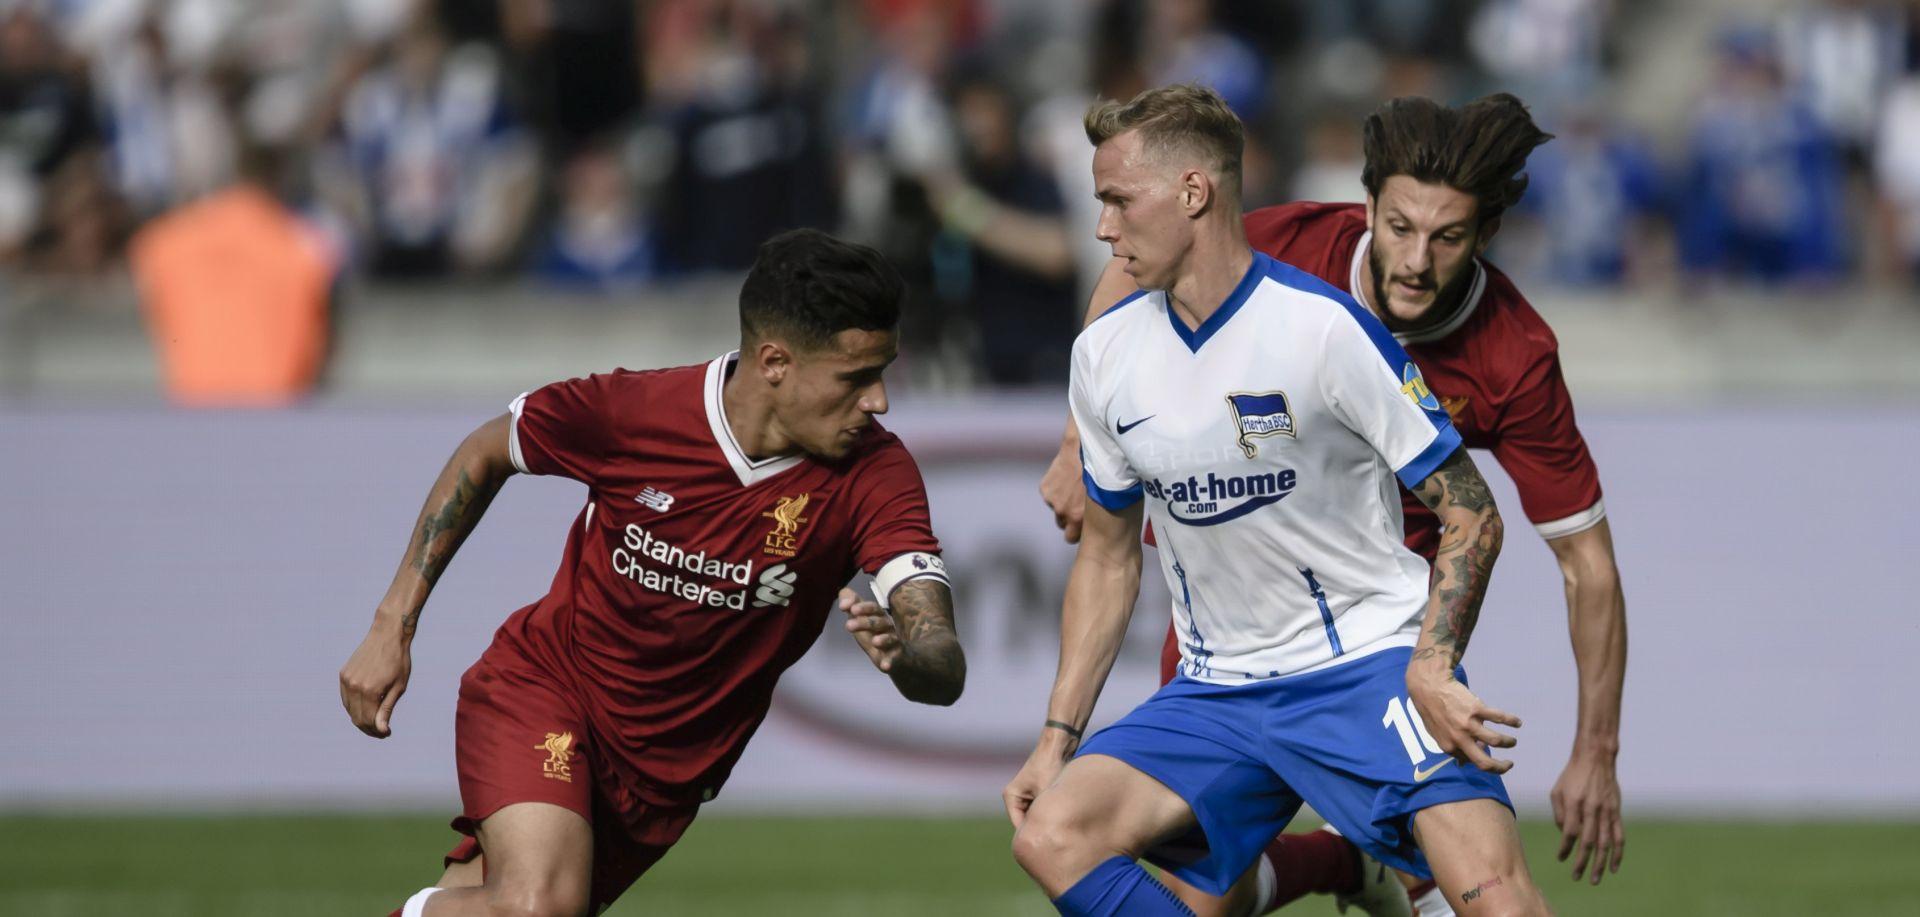 VIDEO: Kapetan Coutinho odveo Liverpool do pobjede nad Herthom